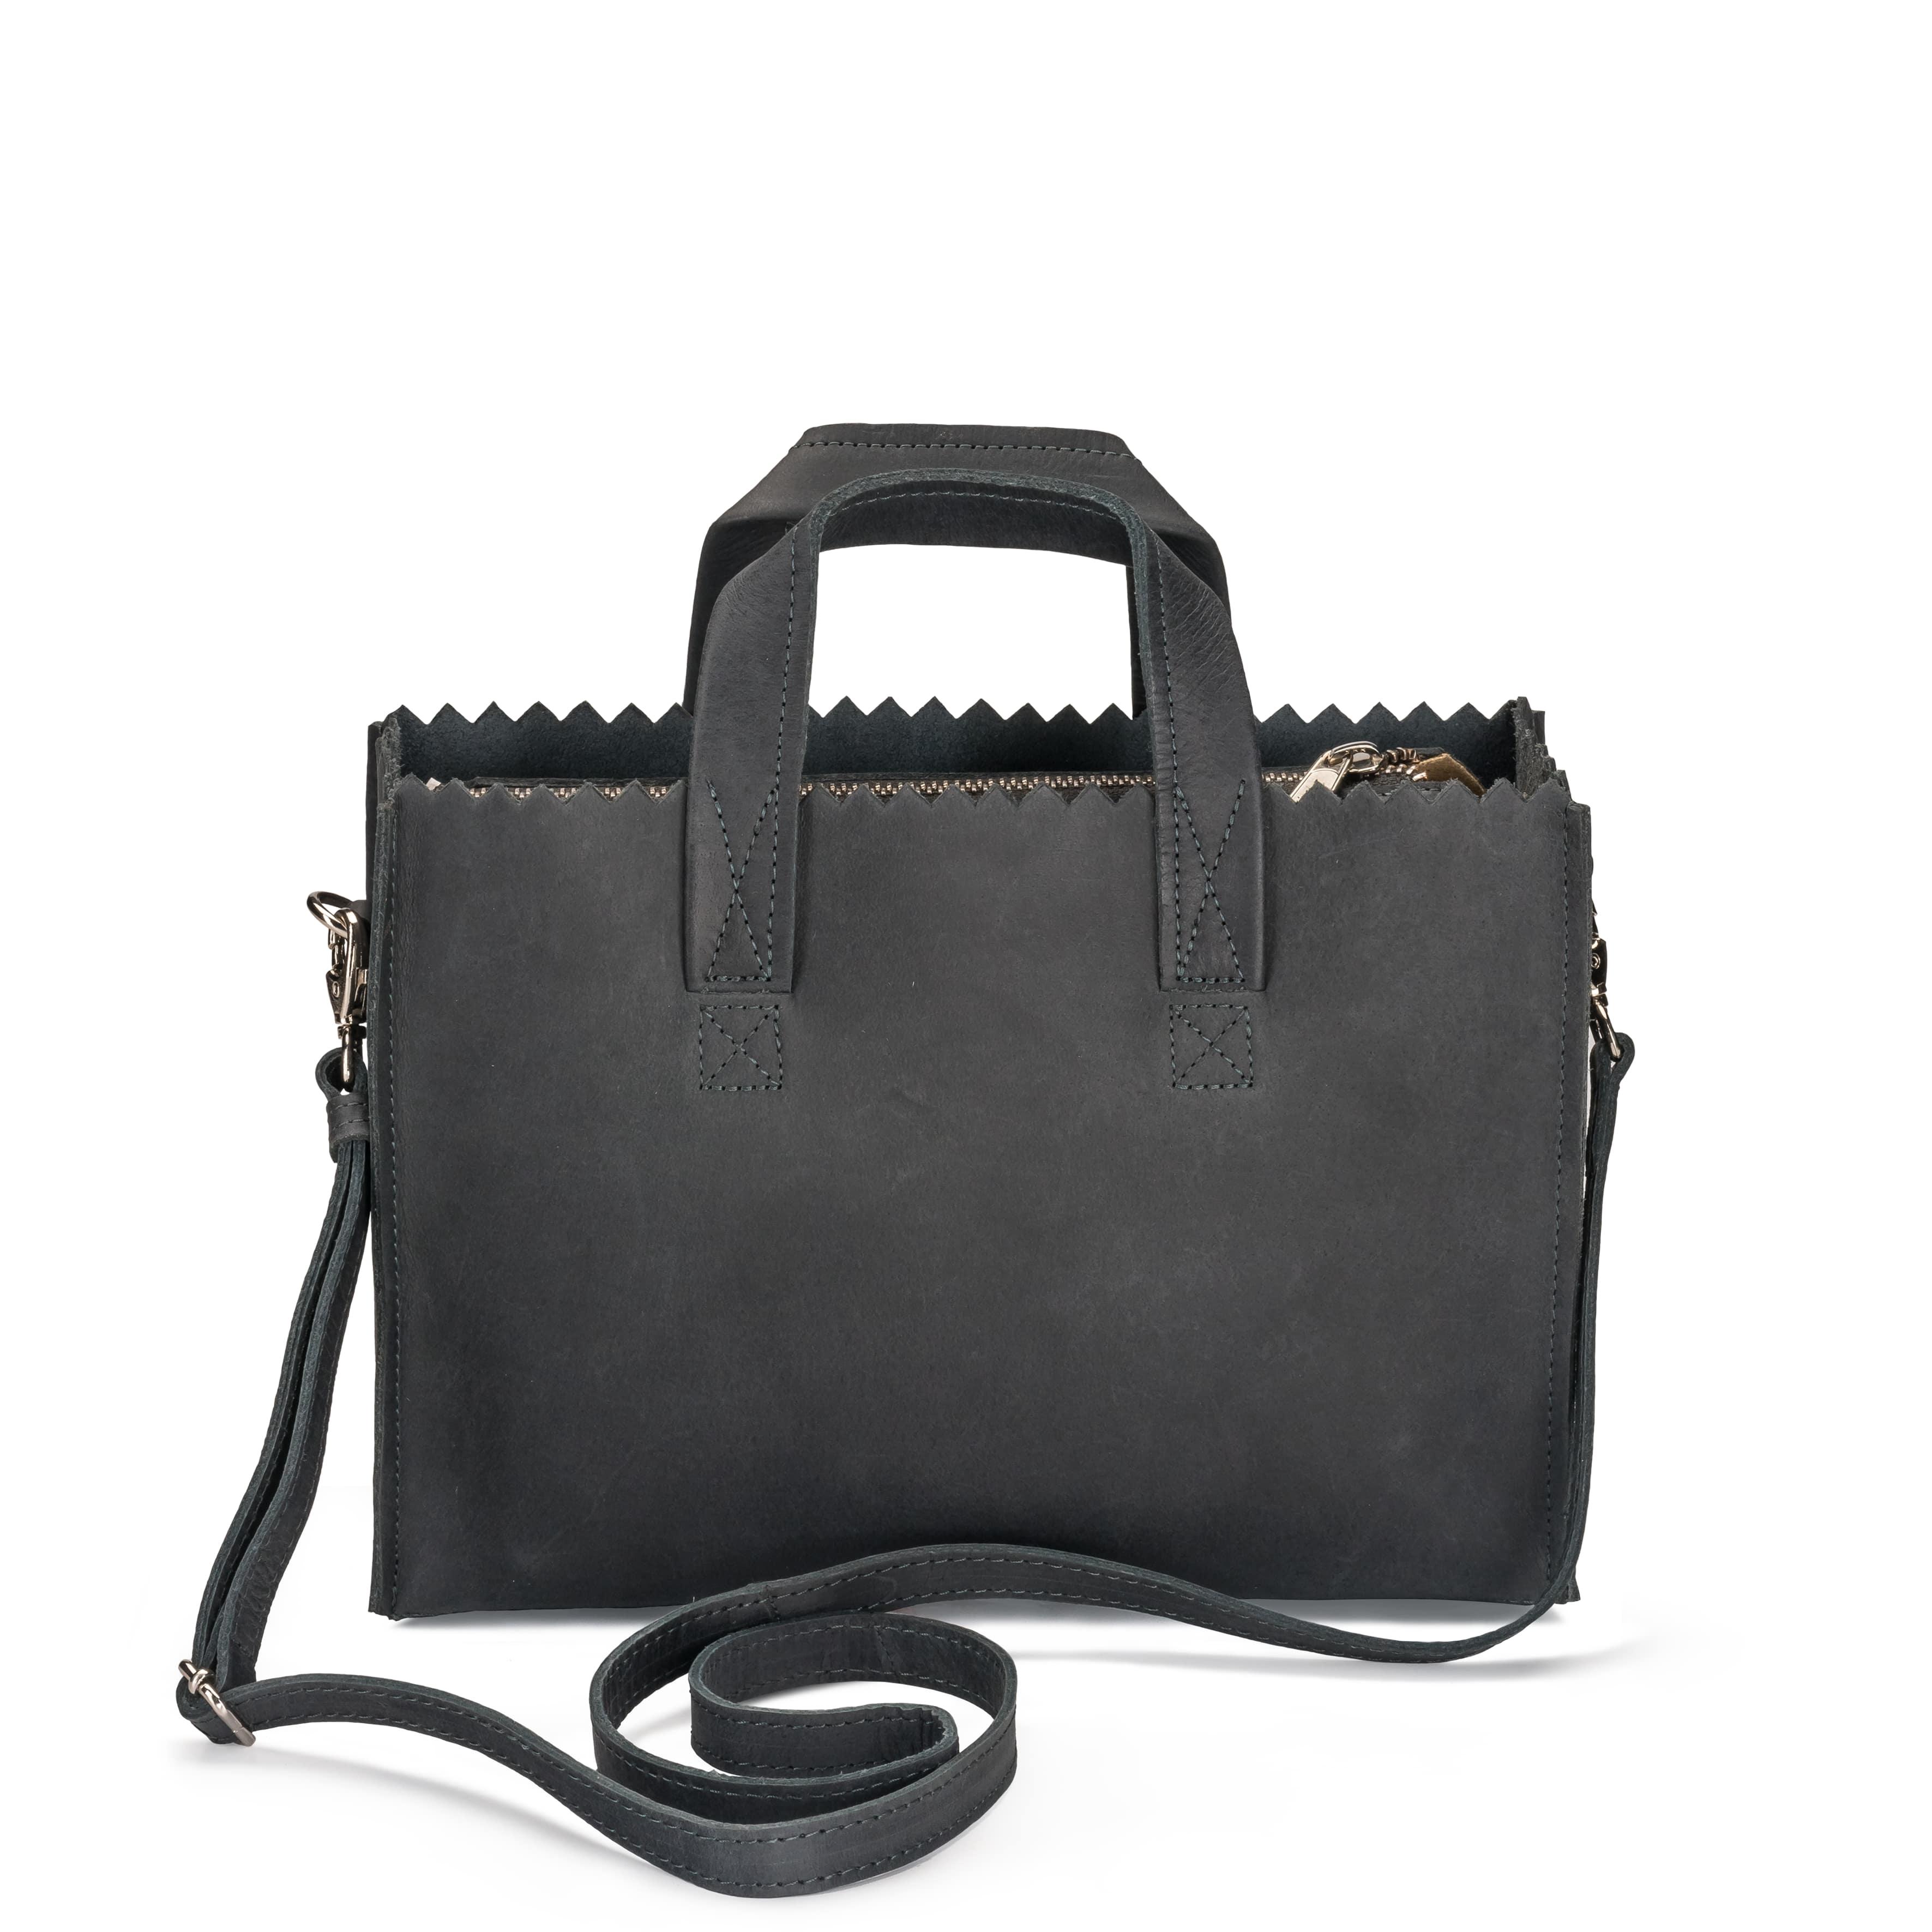 MY PAPER BAG Mini handbag cross-body - hunter off-black